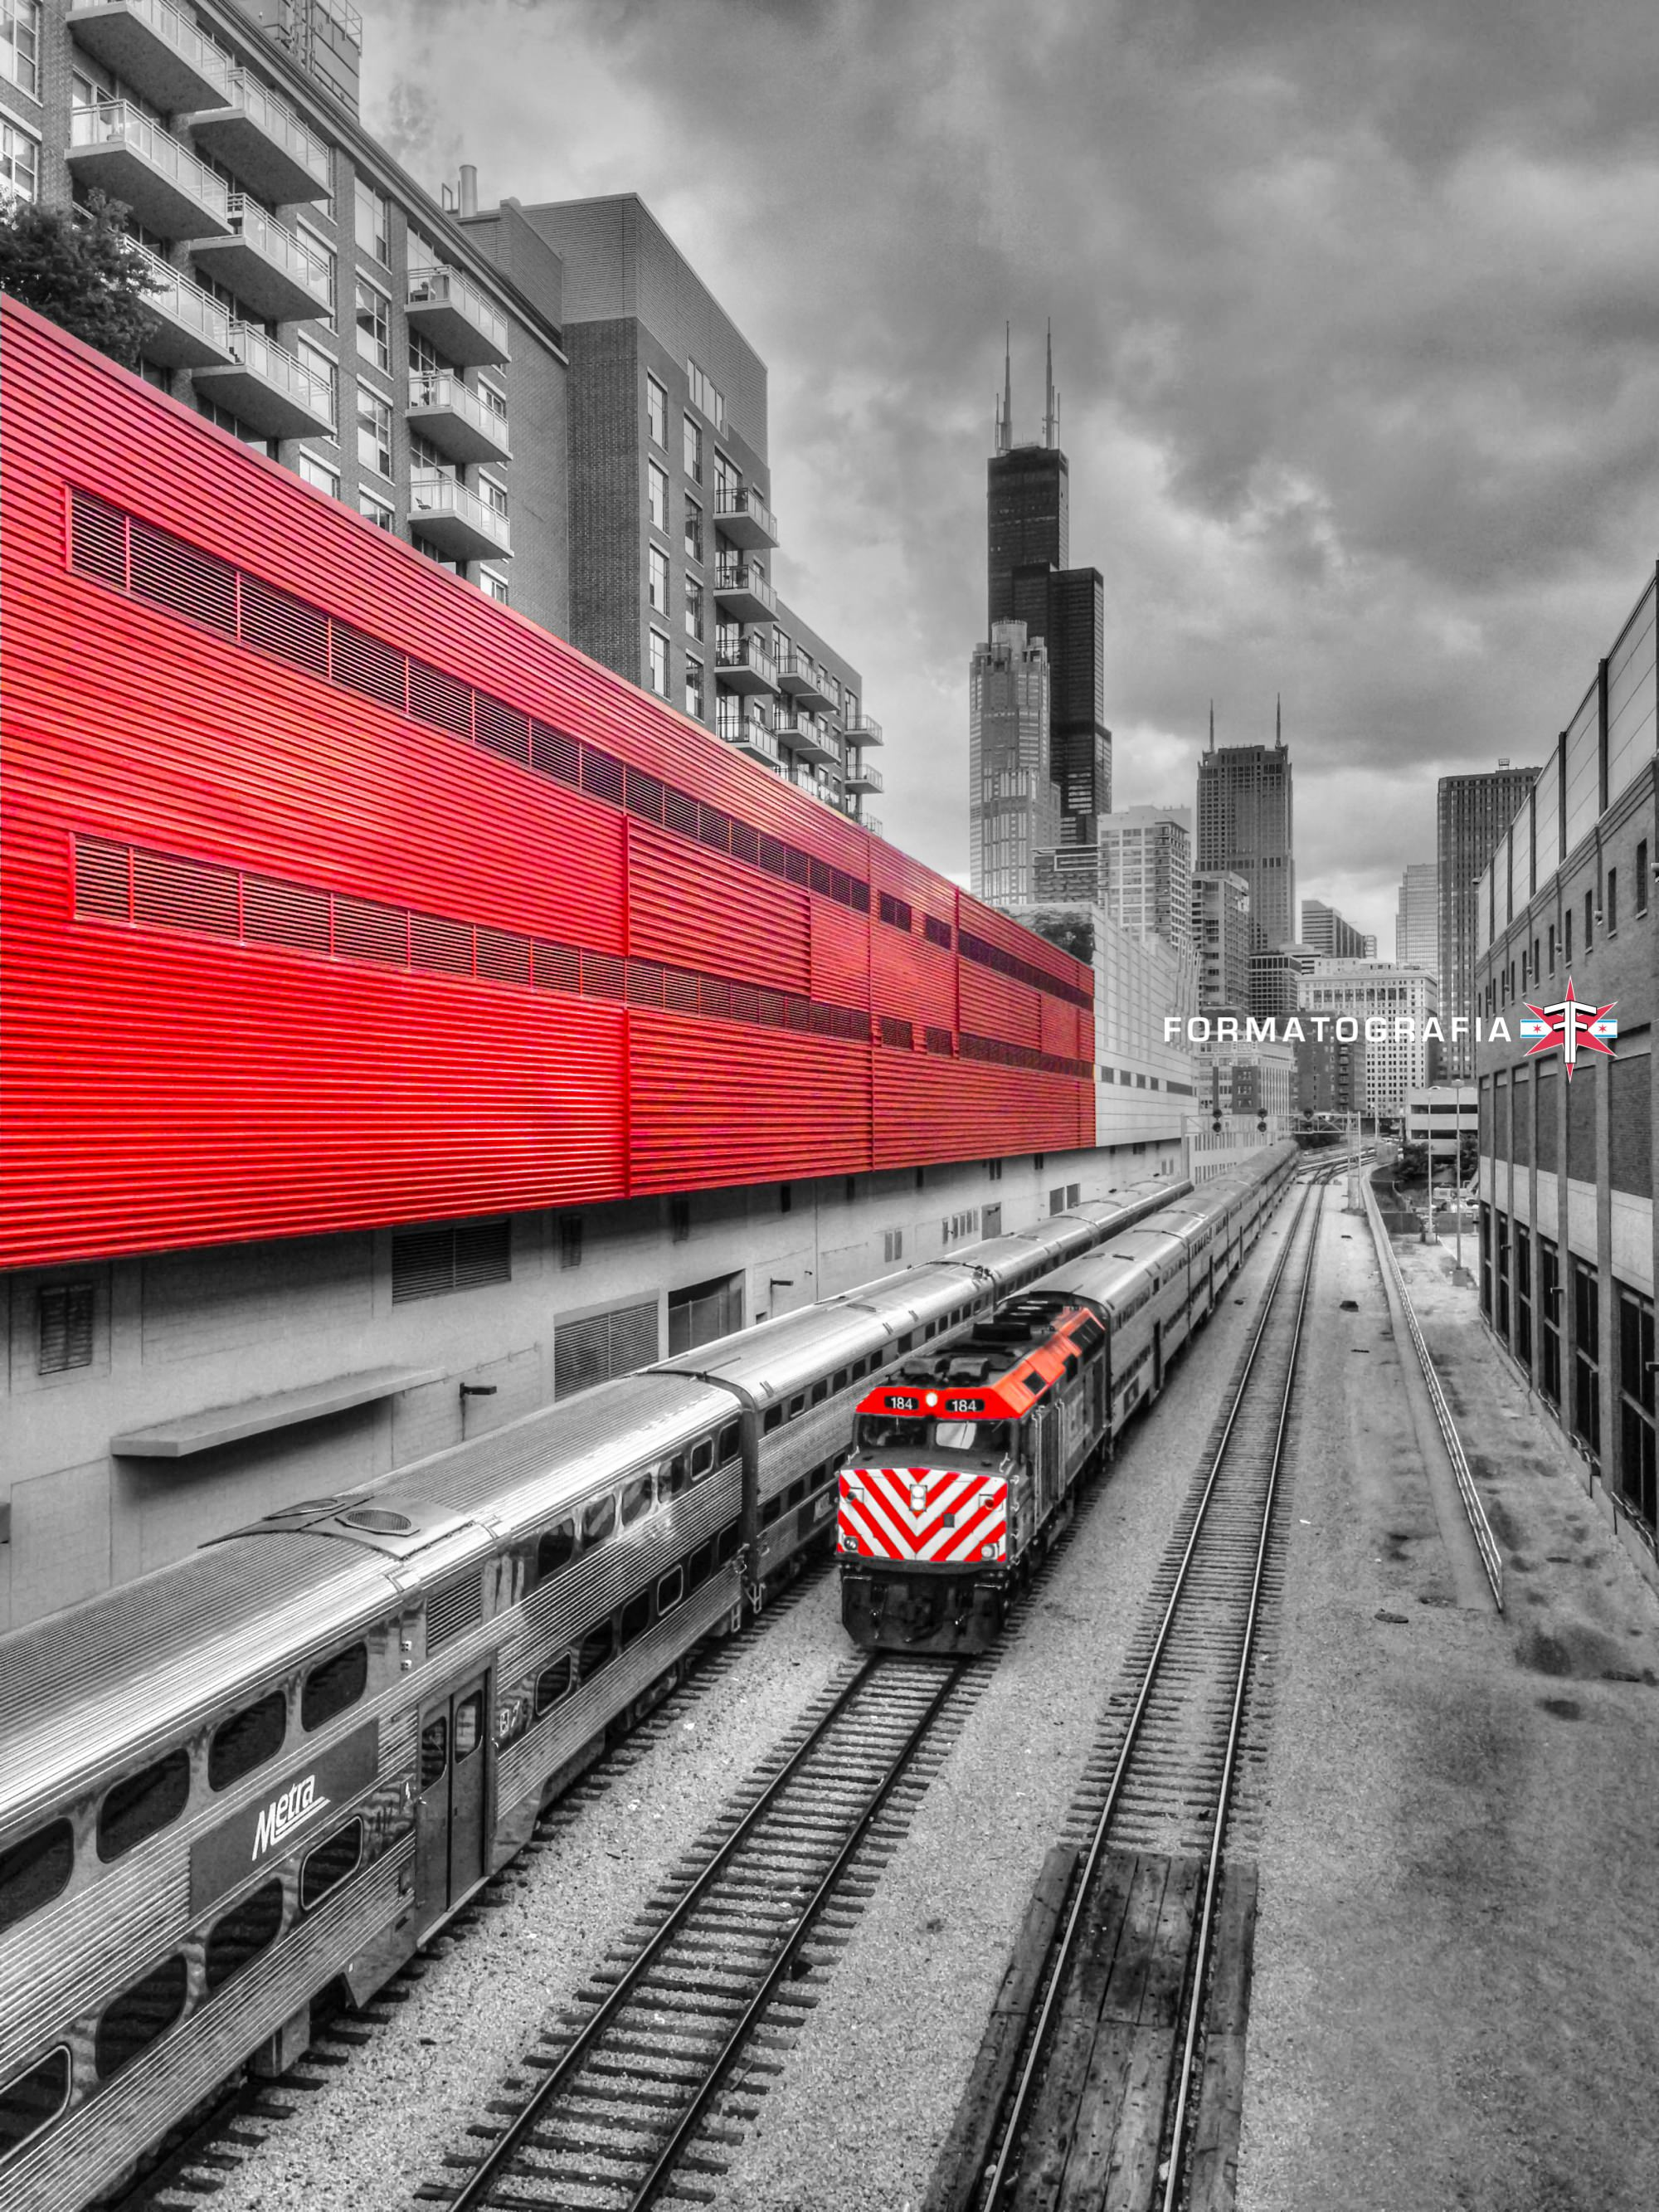 eric formato chicago photographer fall update city architecture shotsIMG_4338_tonemappedREV.jpg